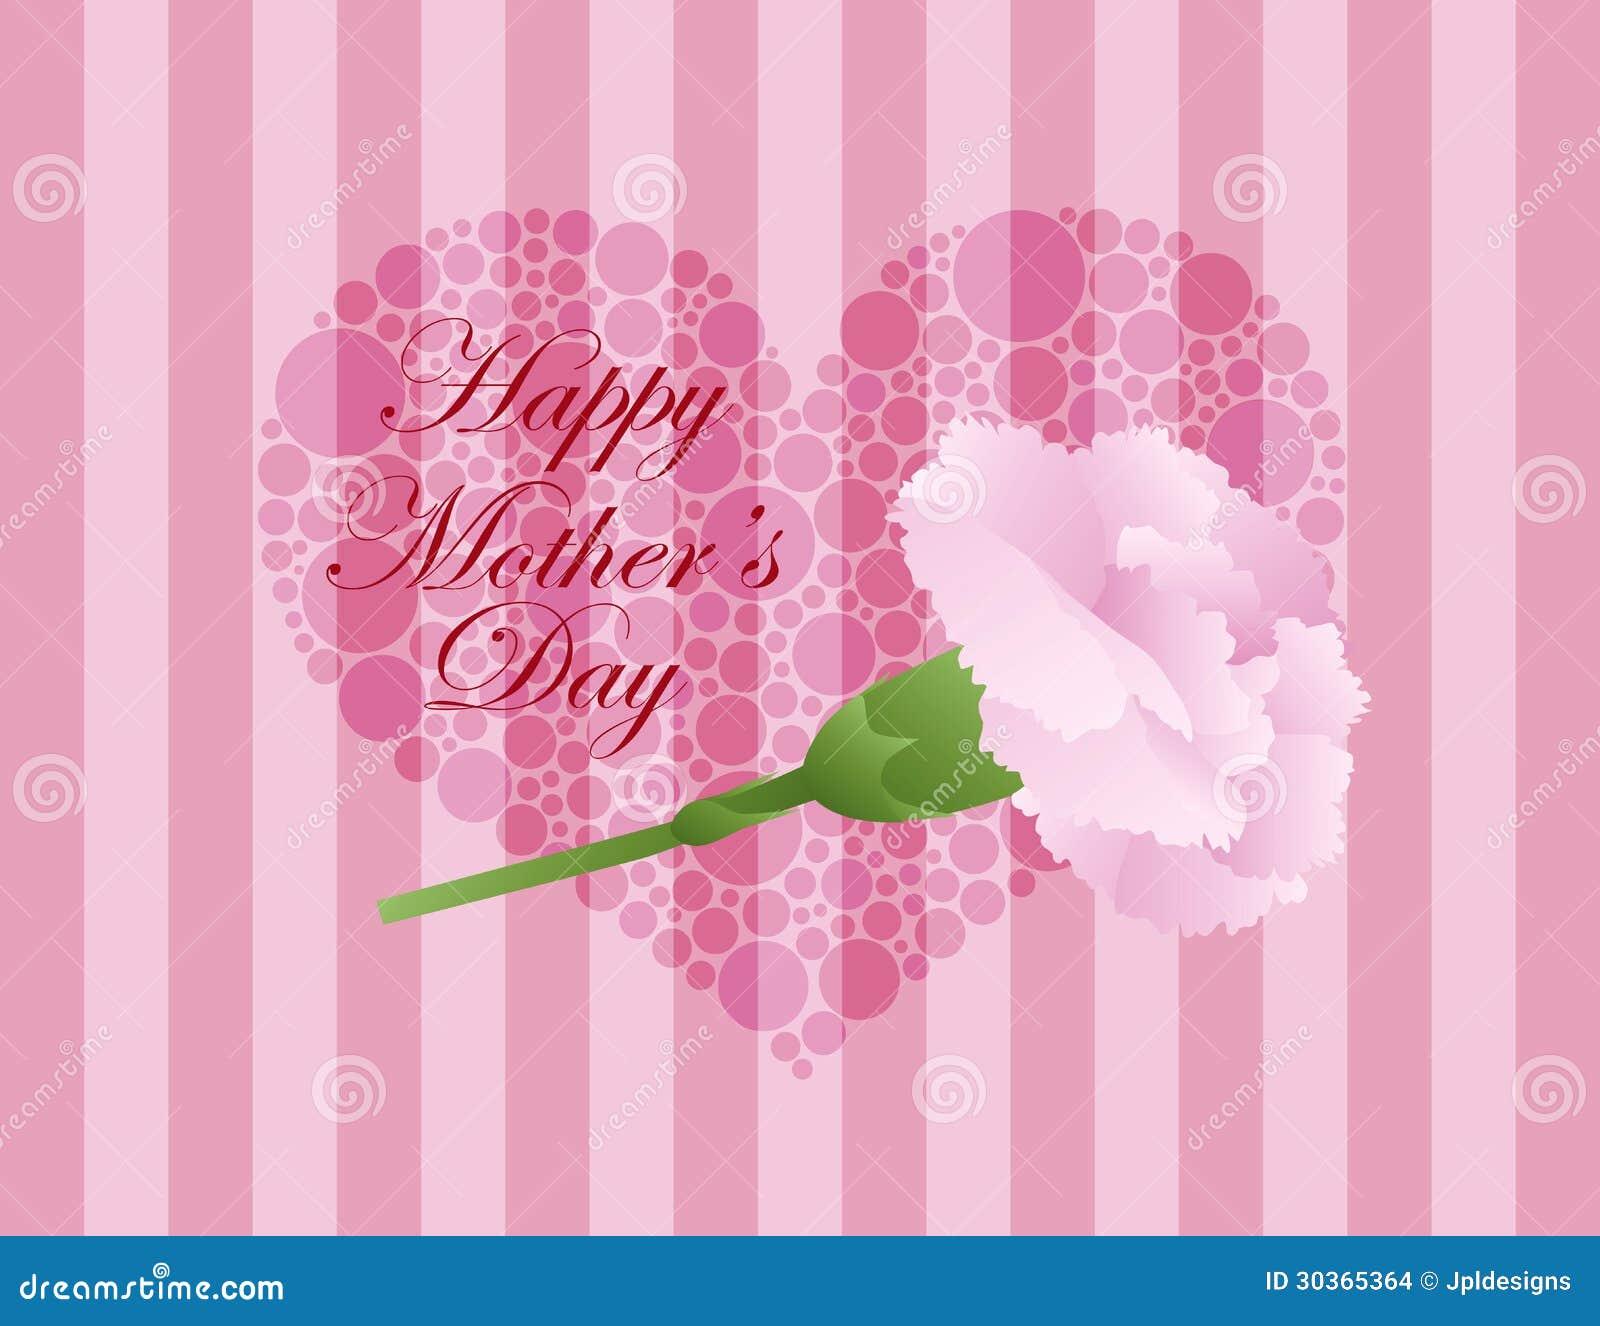 Mothers Day Pink Carnation Flower Illustration Stock Vector